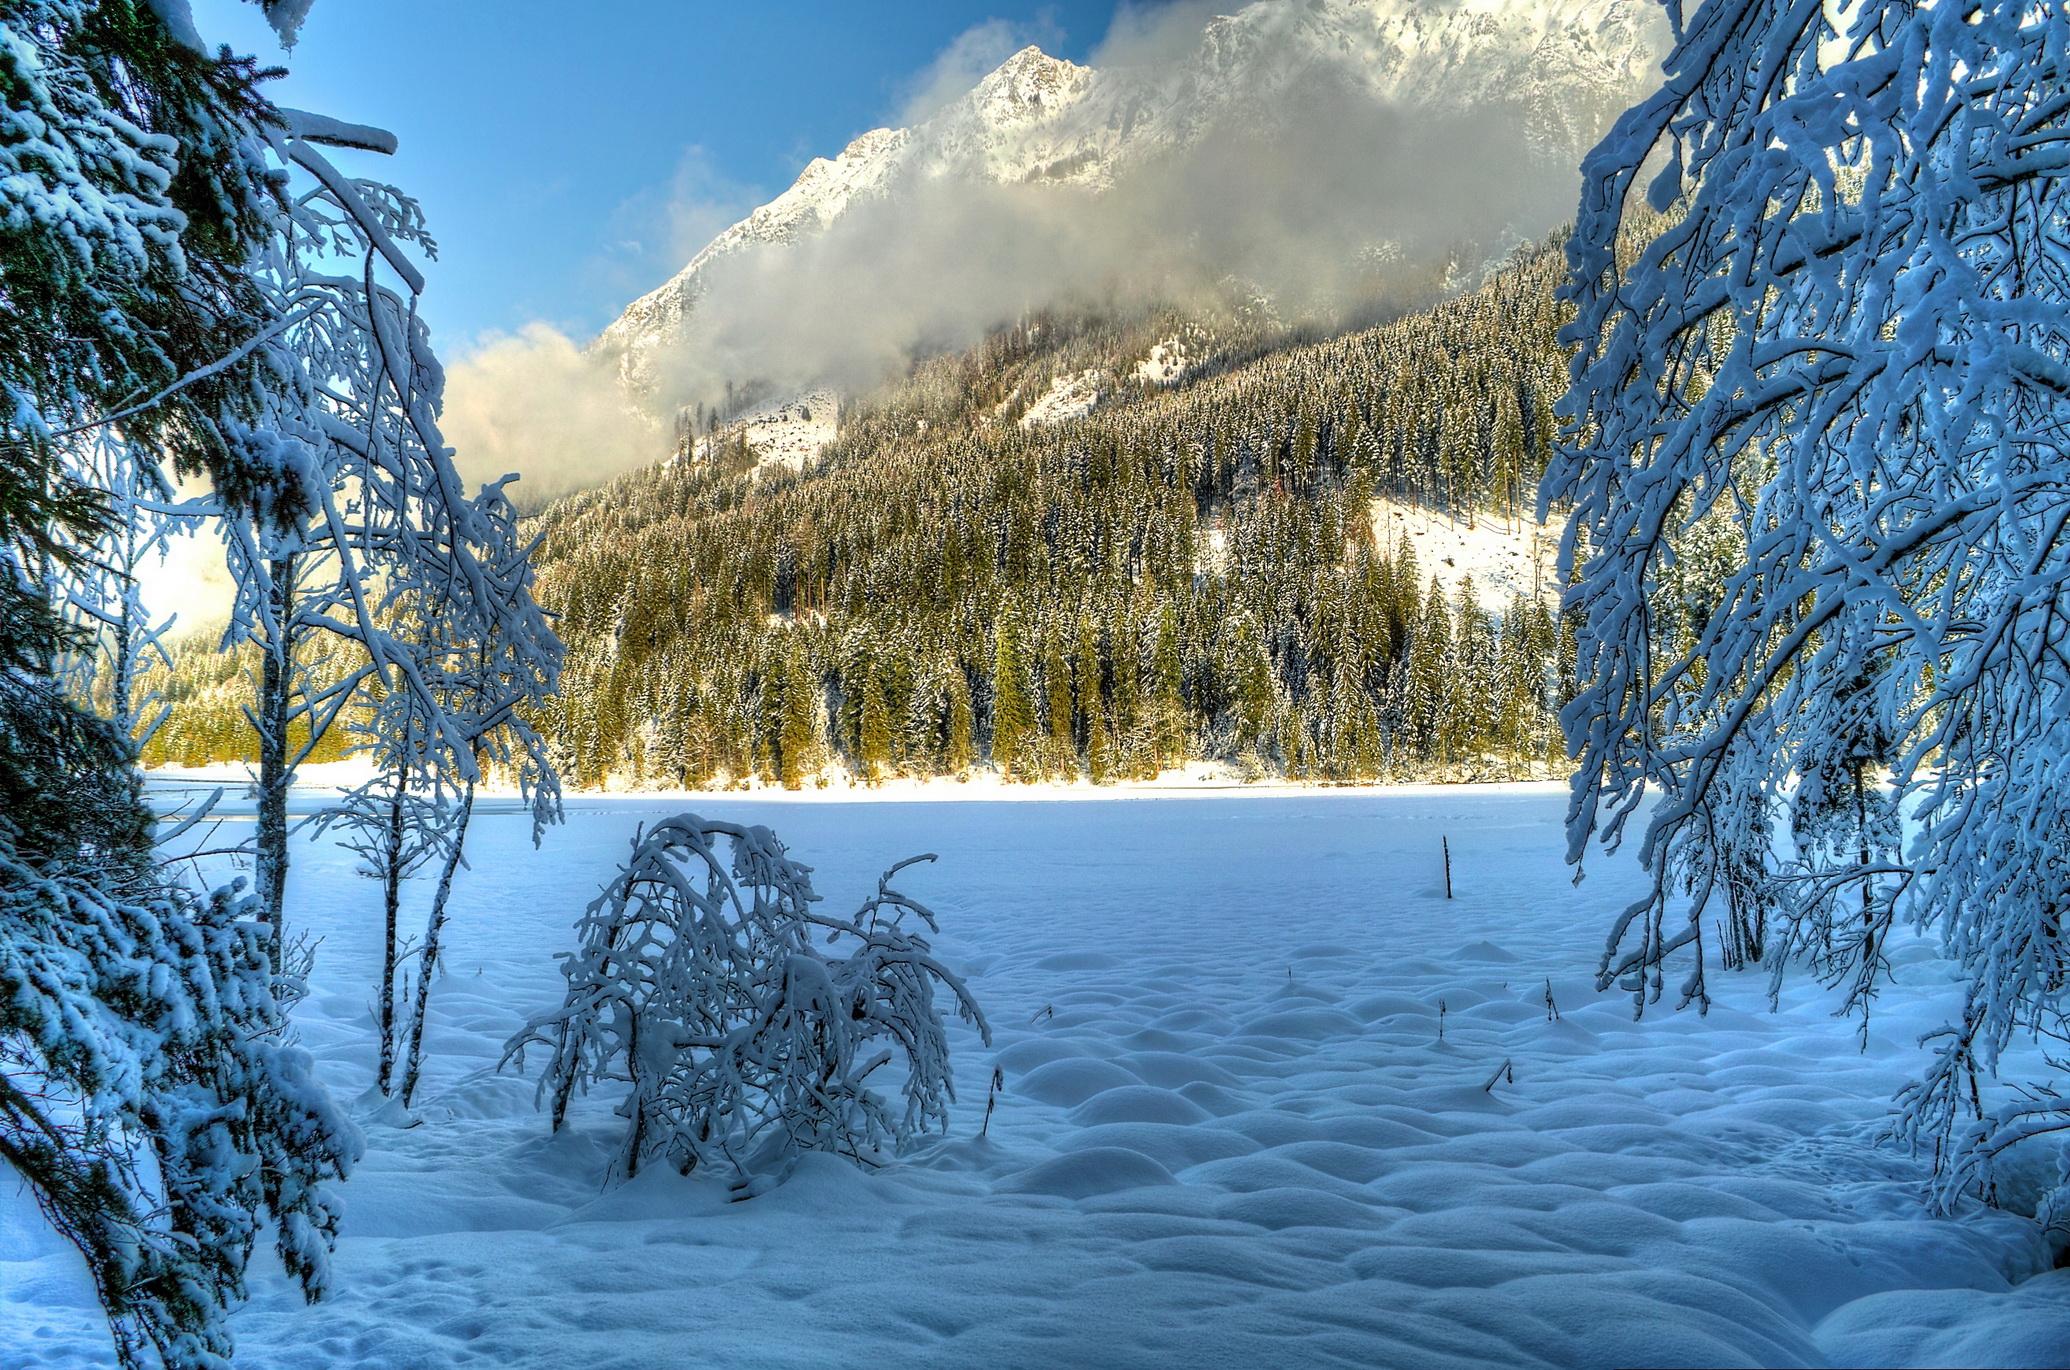 природа скалы деревья горы снег зима nature rock trees mountains snow winter  № 455844 бесплатно